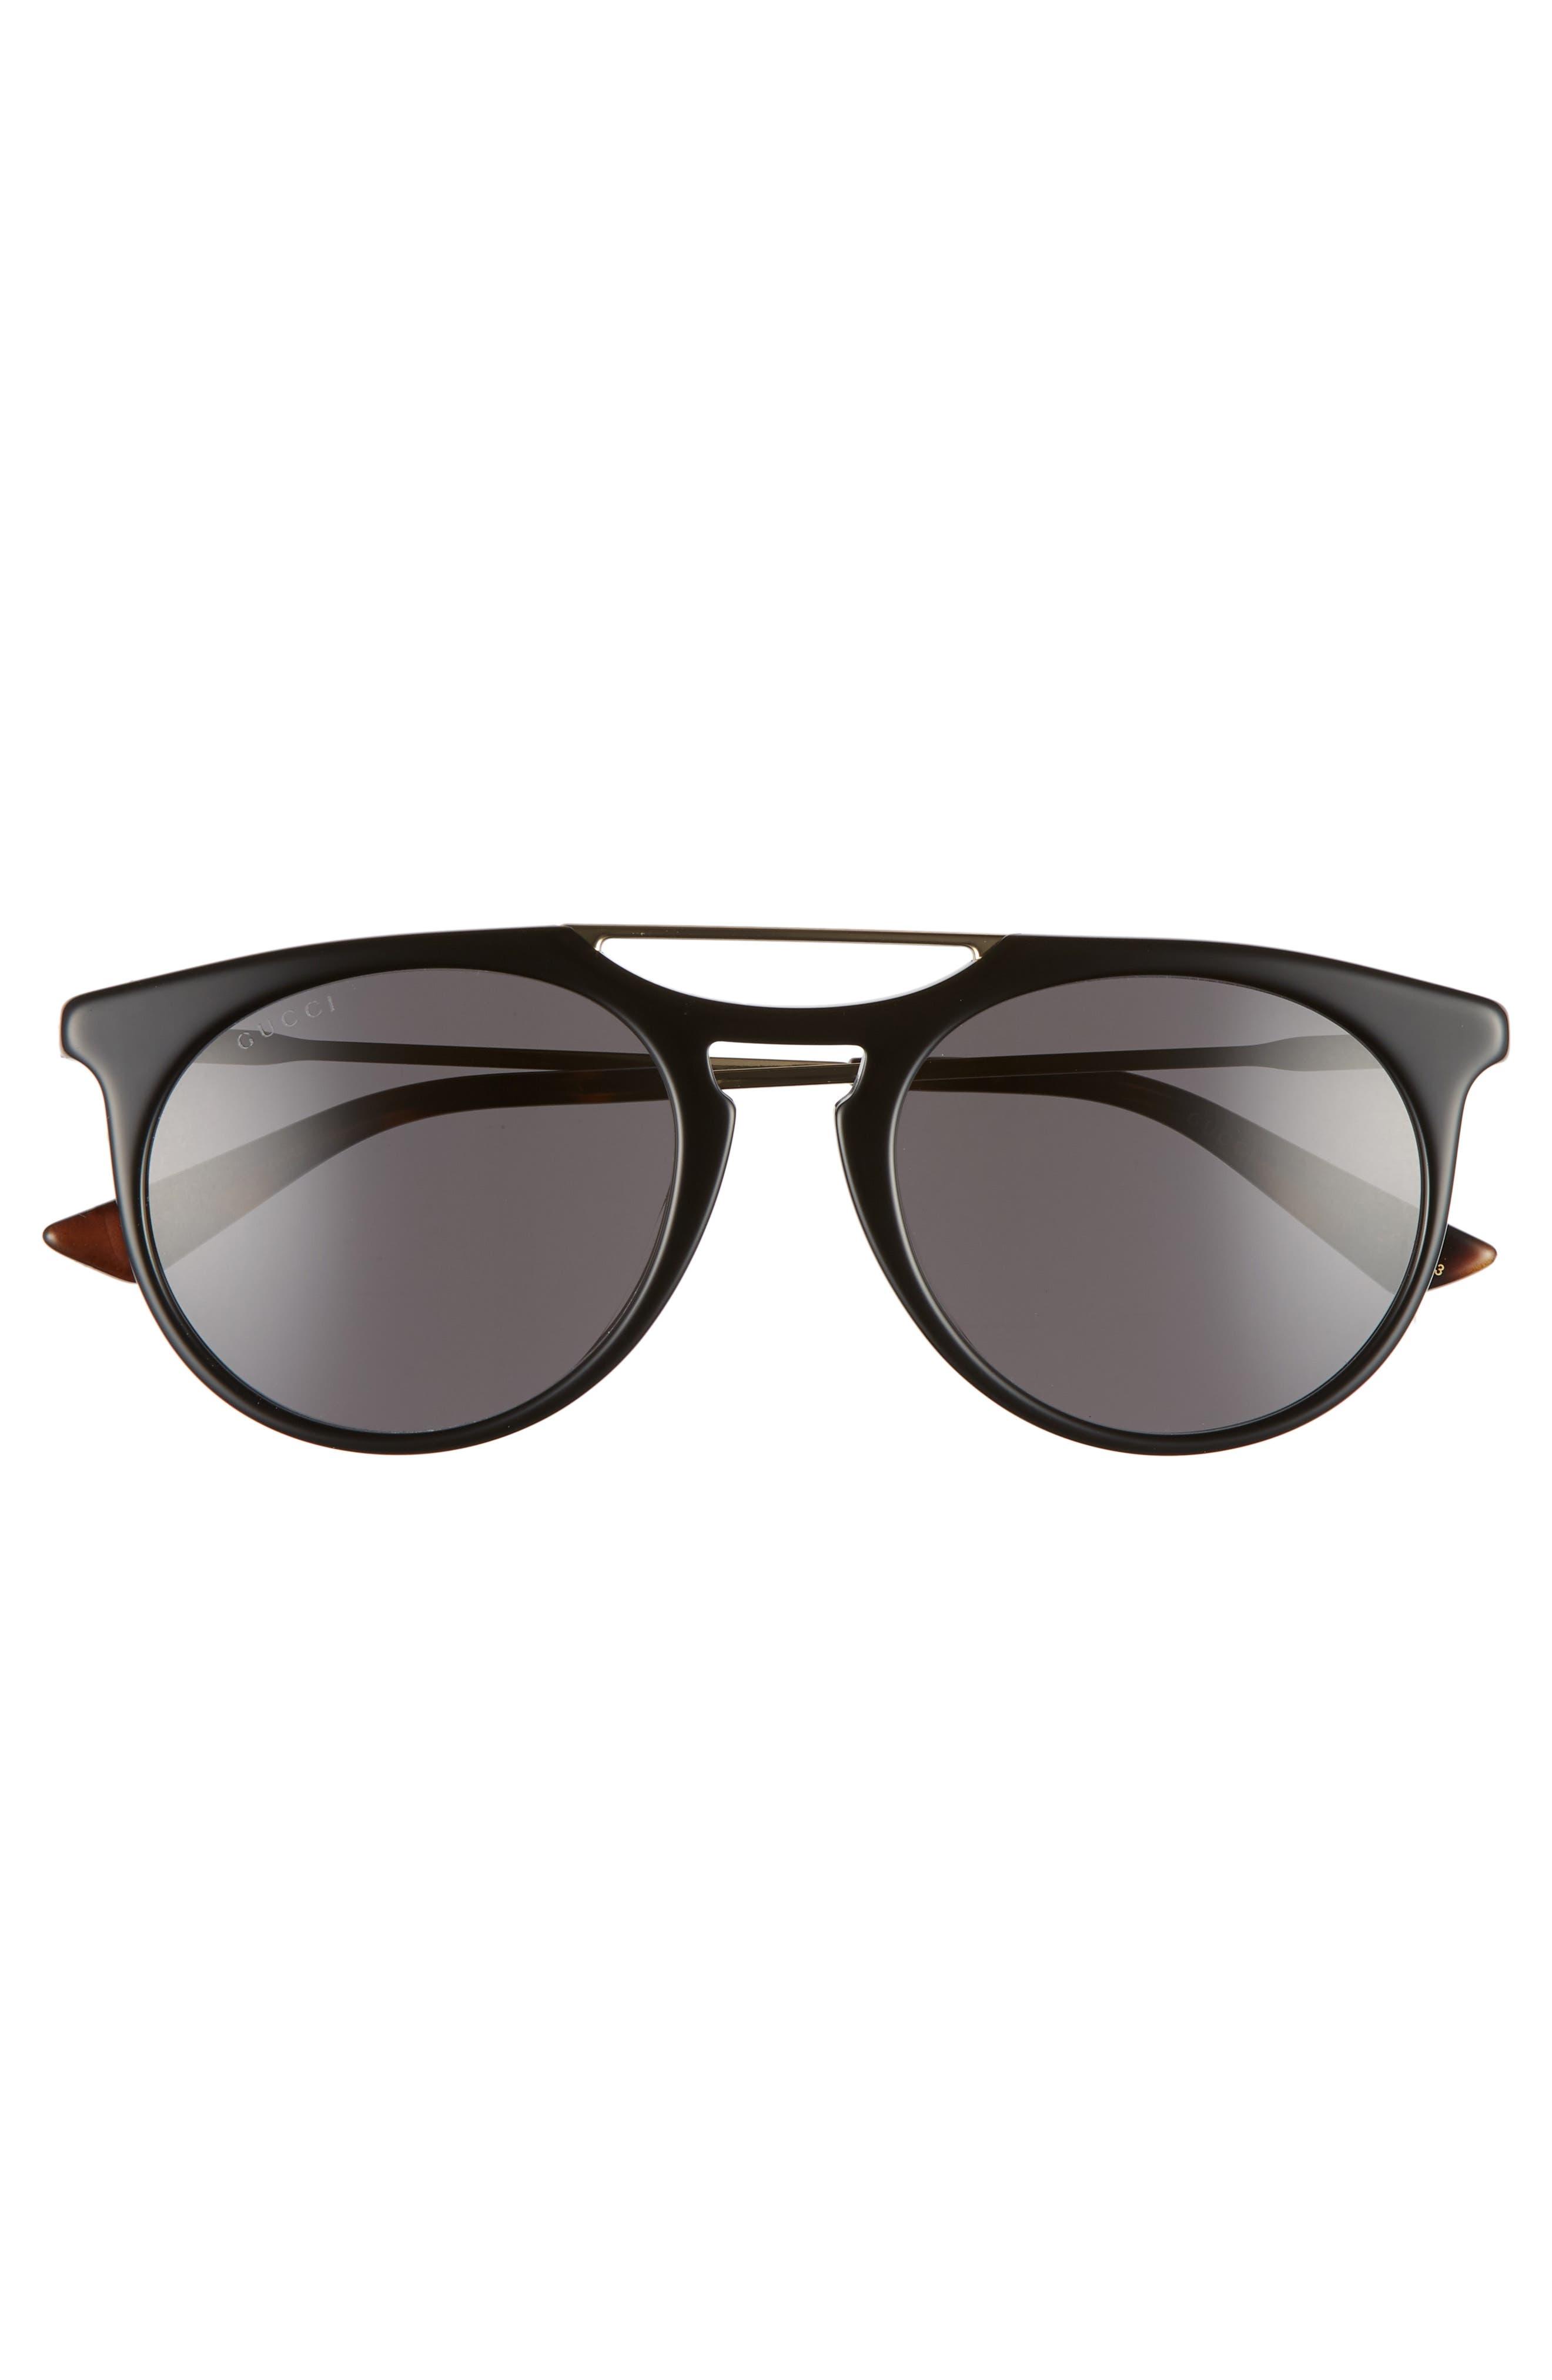 Light Combi 53mm Sunglasses,                             Alternate thumbnail 2, color,                             Gold/ Dark Havana